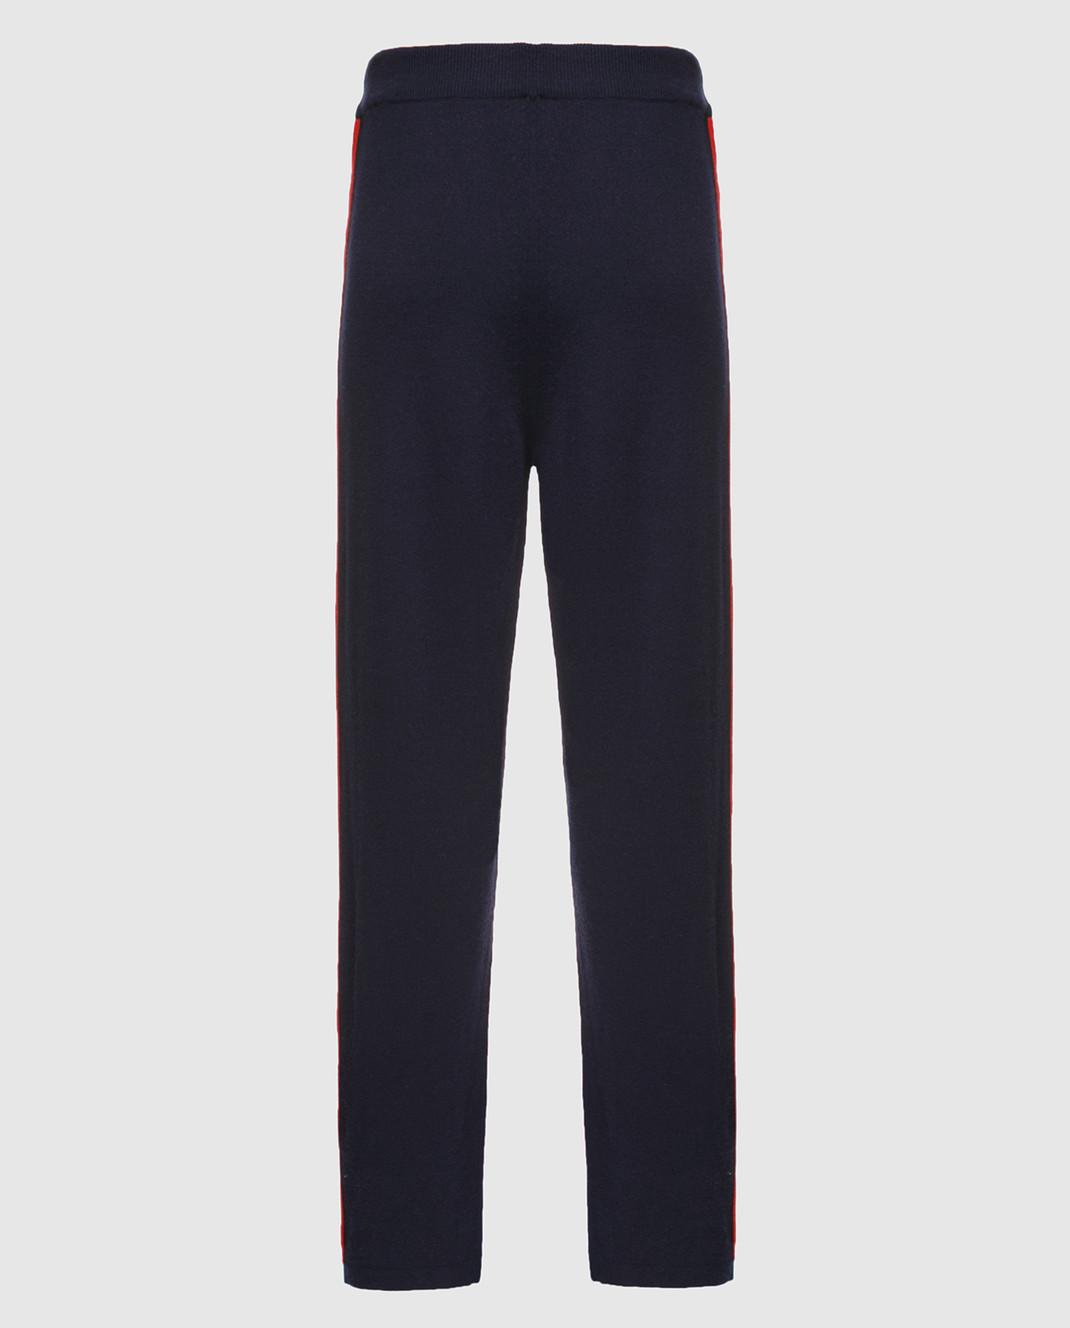 Johnstons Темно-синие брюки из кашемира KAL03898 изображение 2